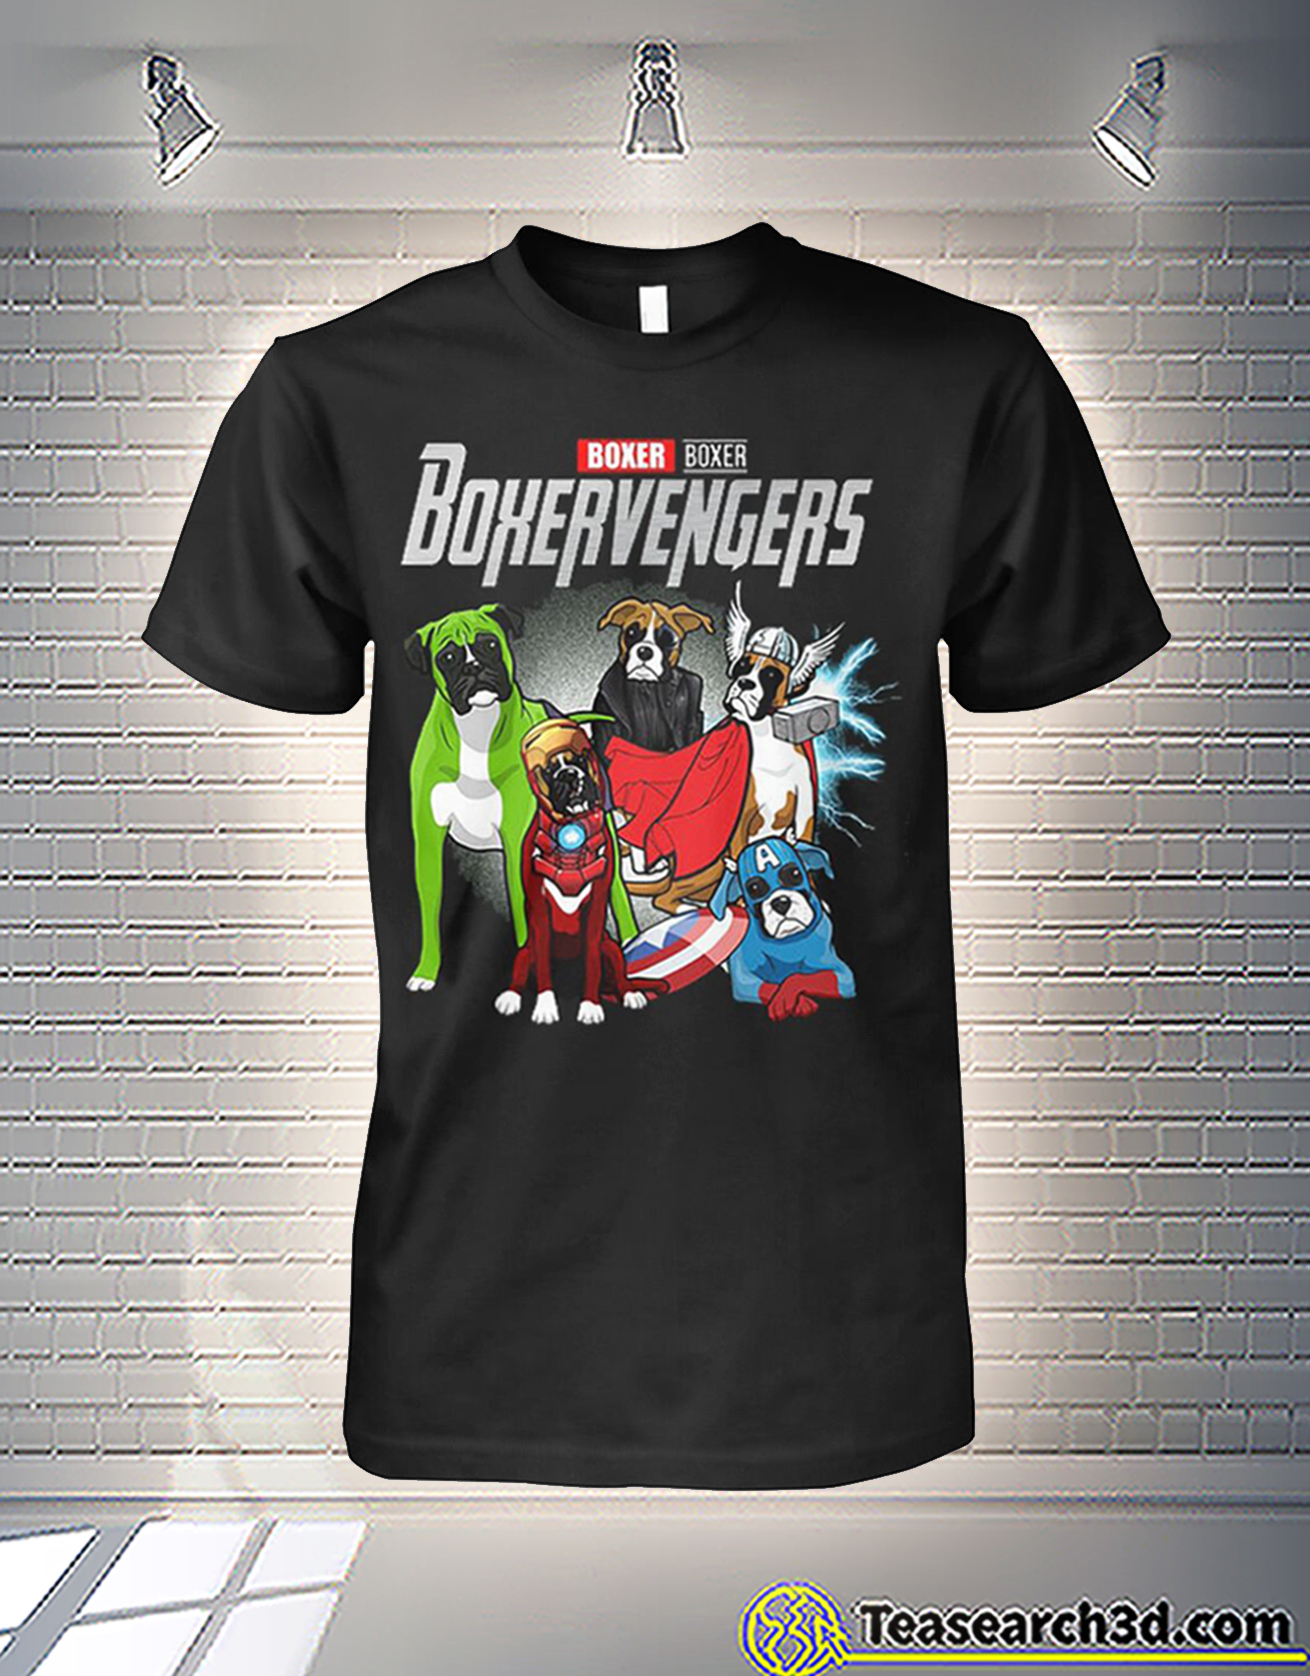 Boxer boxer boxervengers avengers shirt